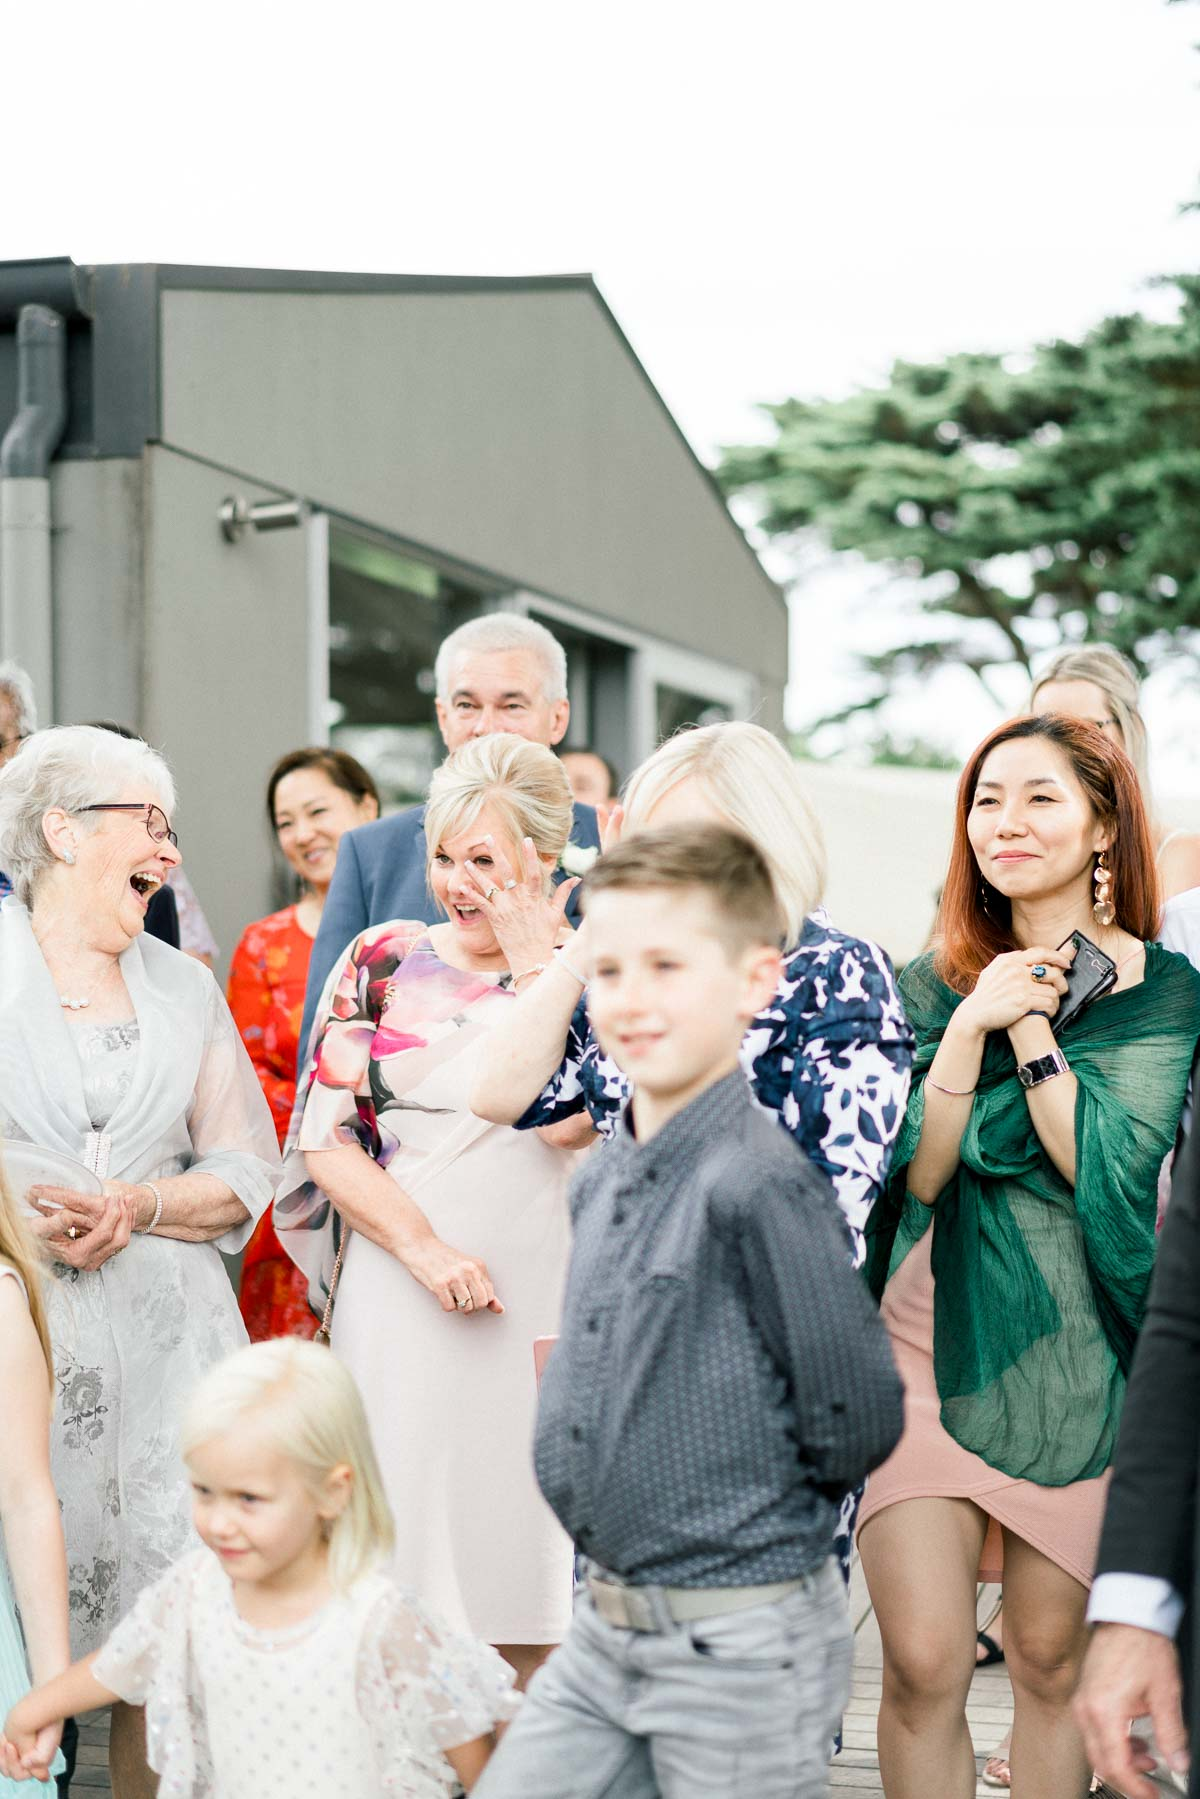 trenavin-chapel-phillip-island-wedding-heart+soul-weddings-sally-sean-00592.jpg